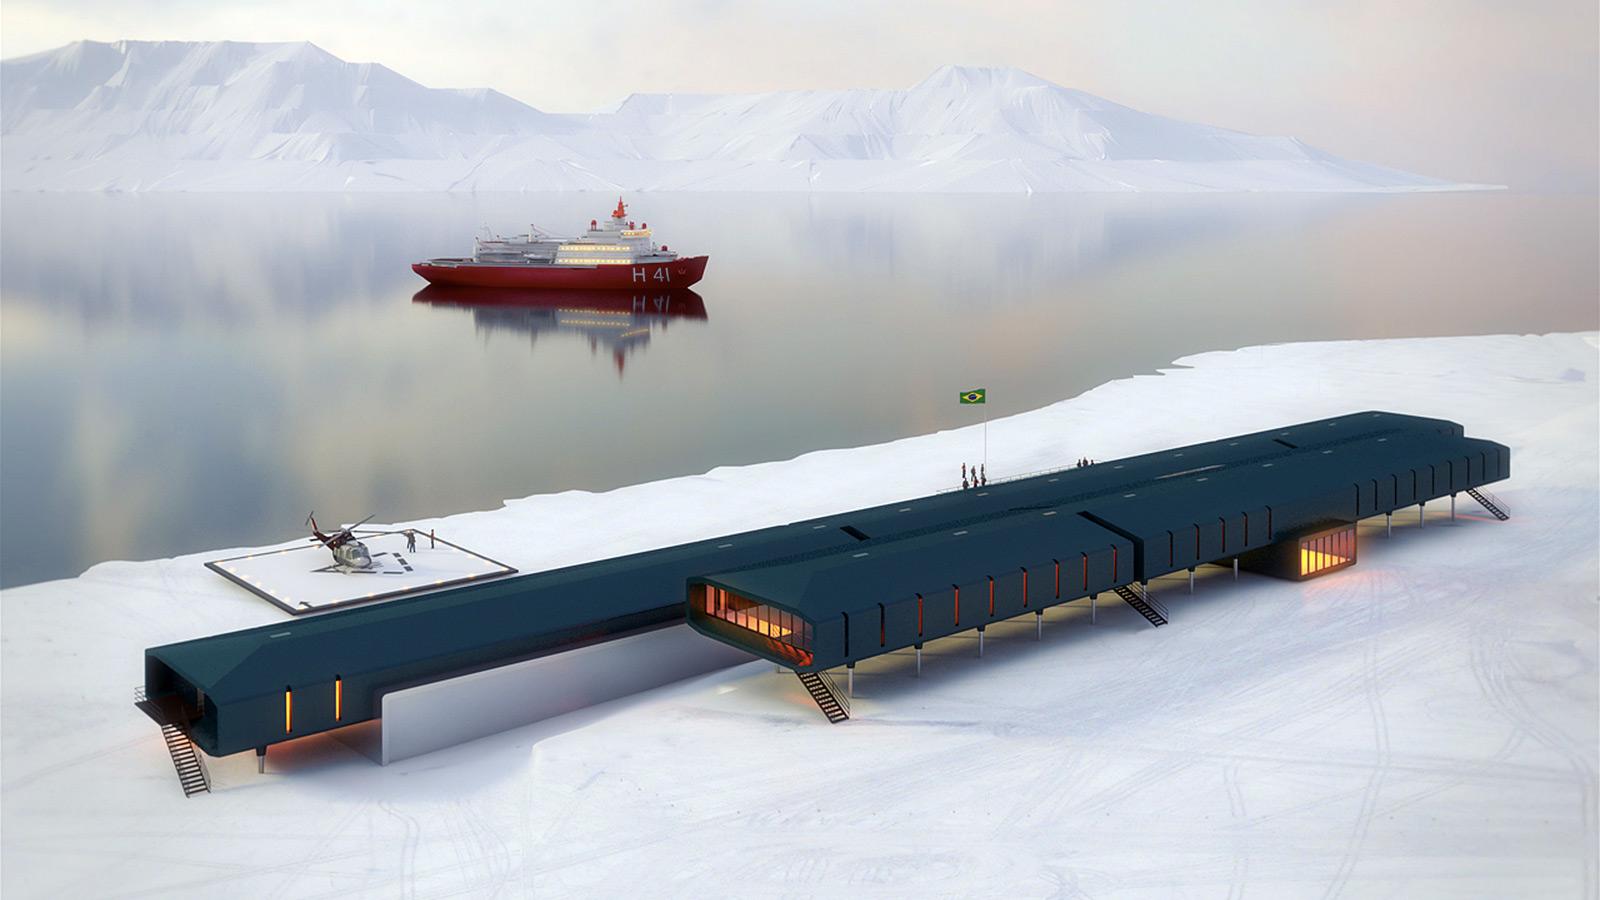 estudio-41-estacao-antarctica-ferraz-brazil-antarctic-research-station-view-ship